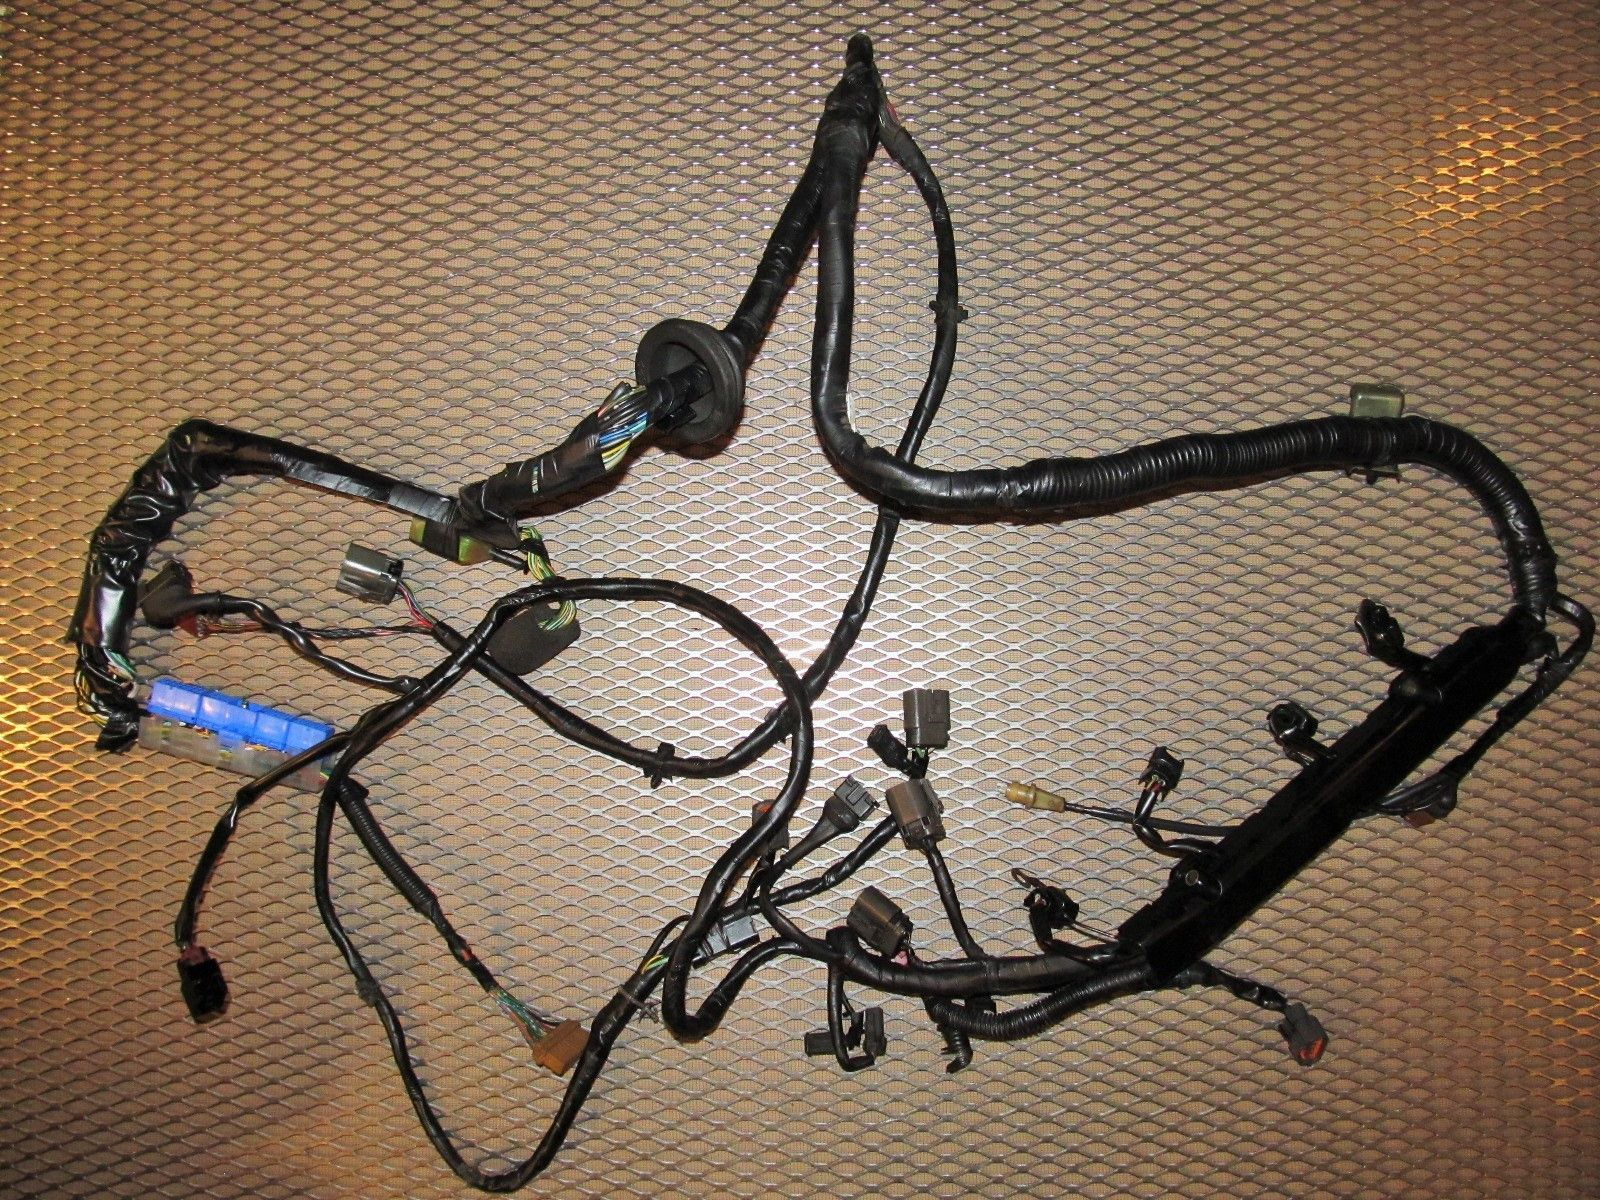 91 92 93 94 nissan 240sx oem engine wiring harness ka24de a t [ 1600 x 1200 Pixel ]